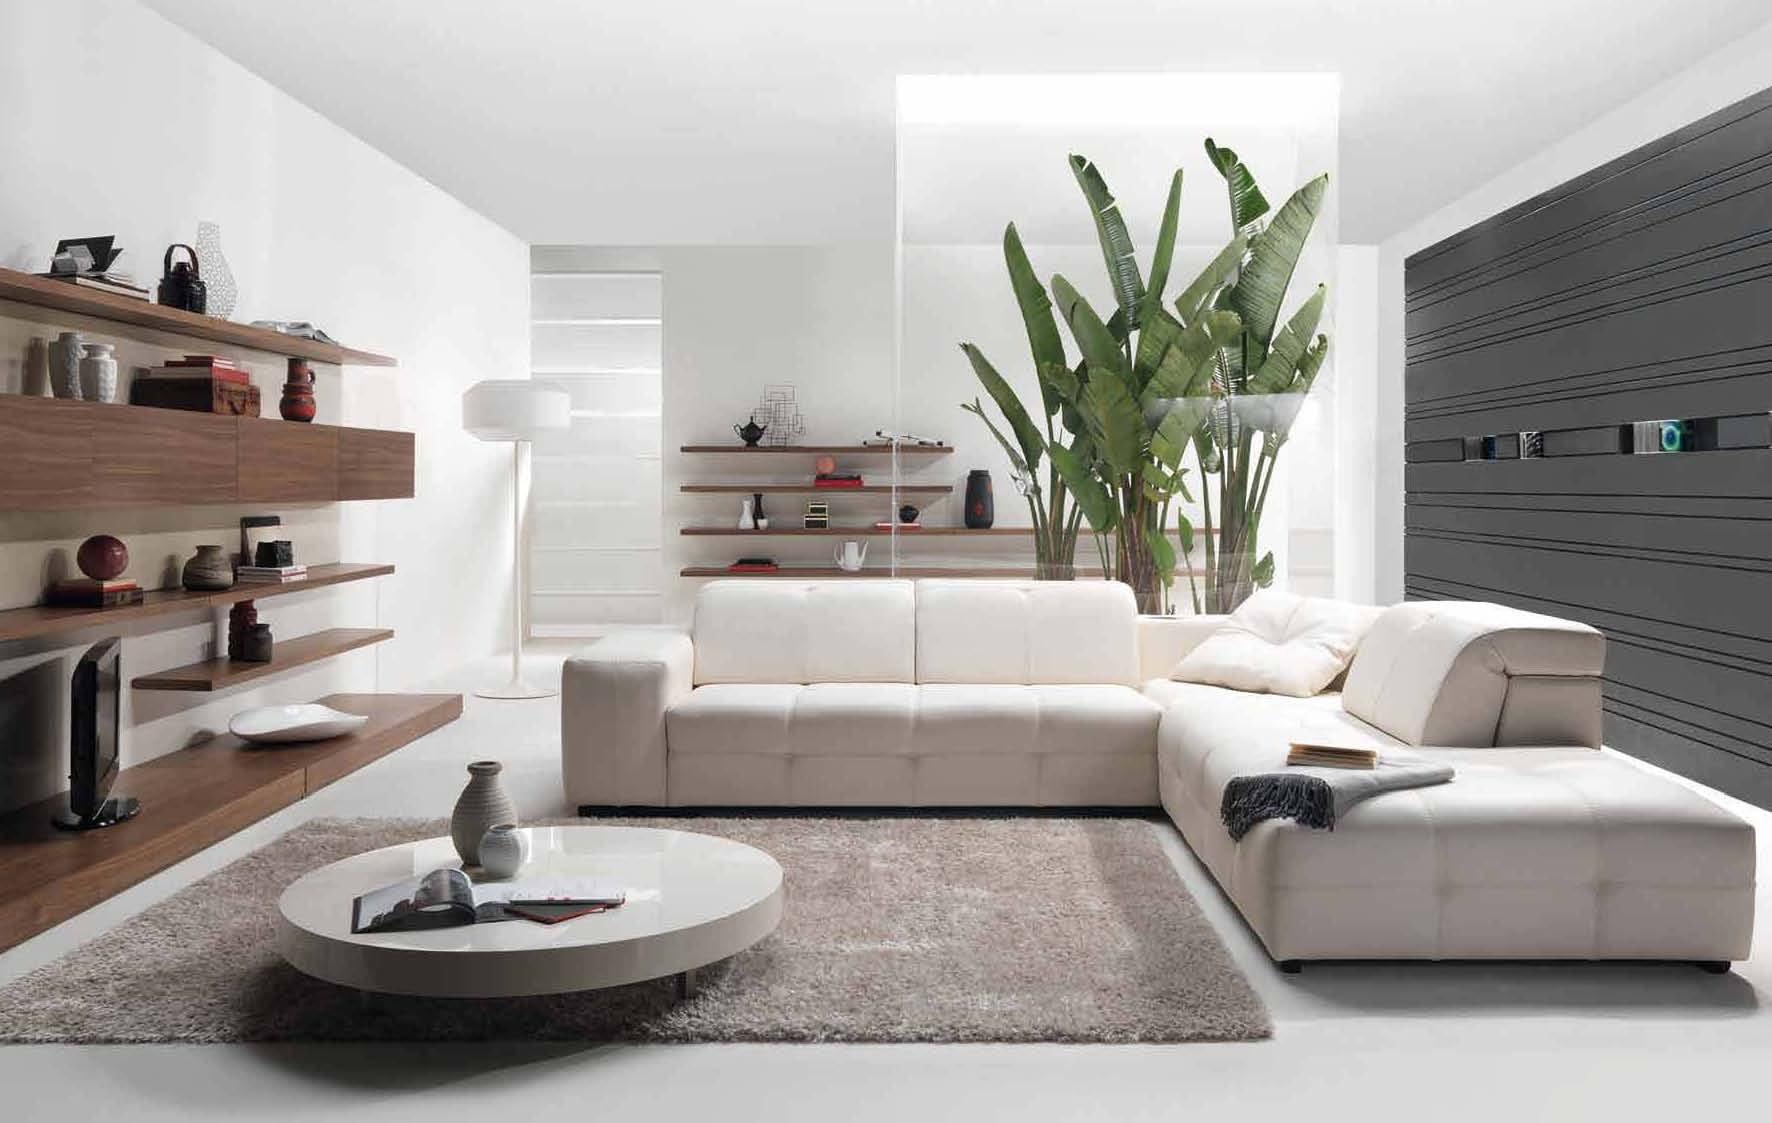 modern-minimalist-style-living-room-decorating-with-shaggy-rug-best-interior-design-ideas